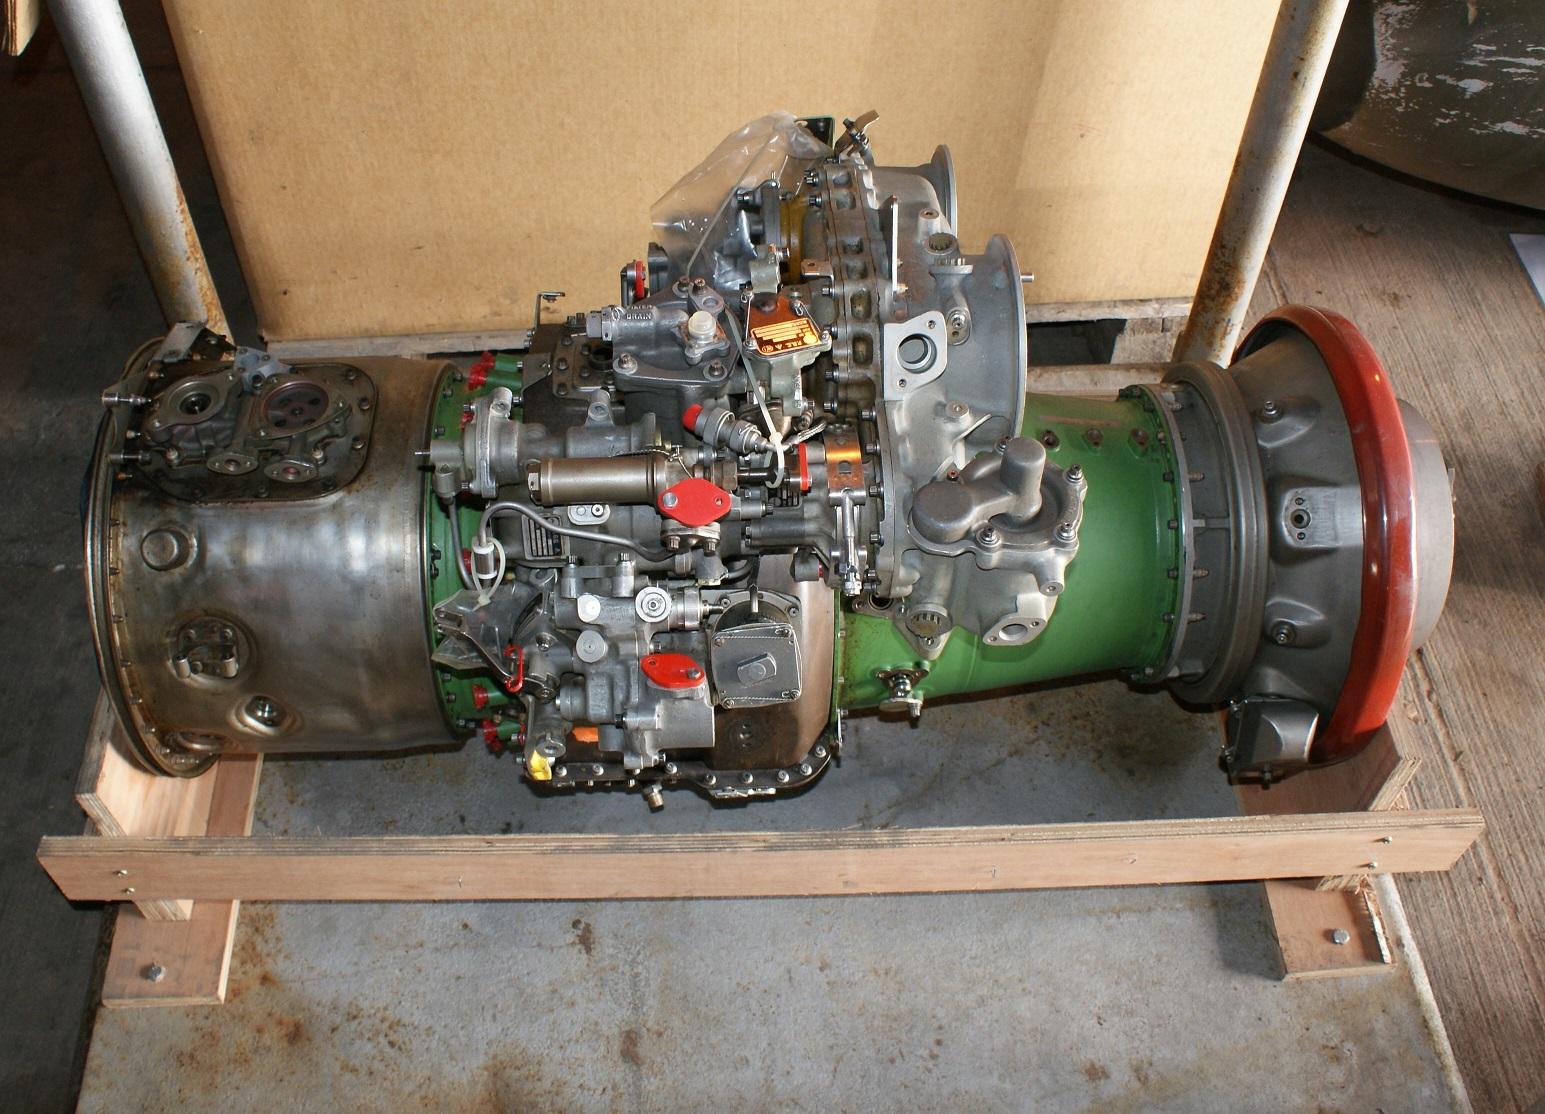 Rolls Royce Turboshaft Engines